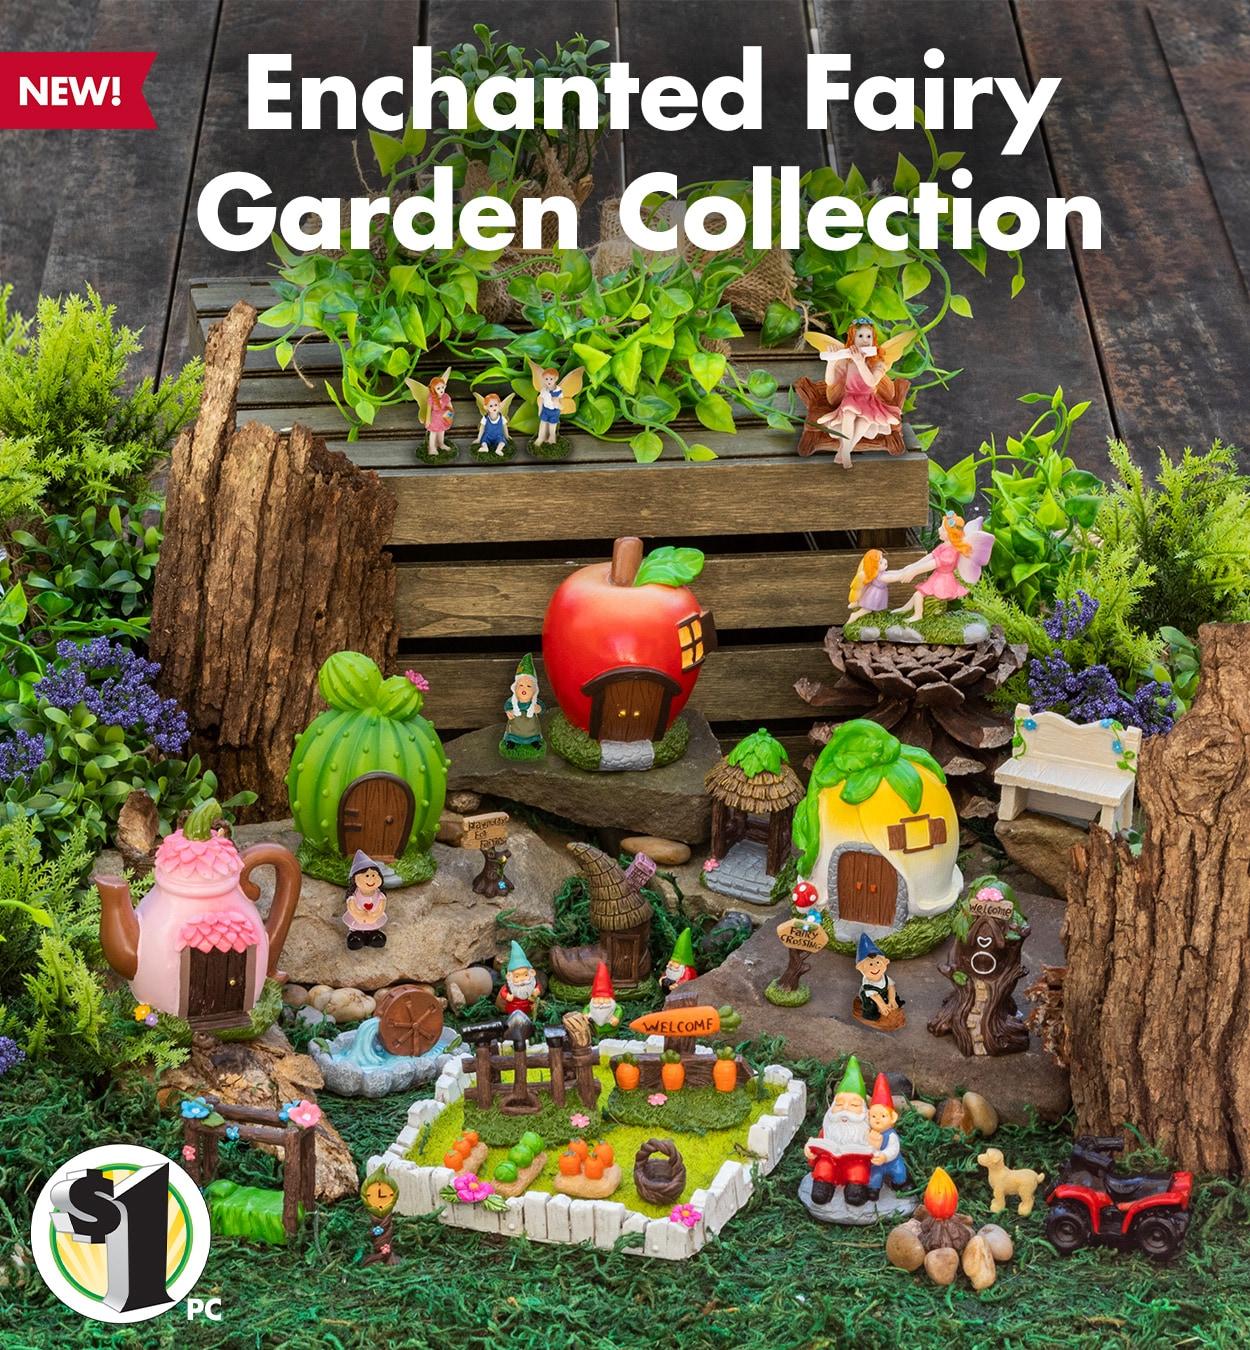 Shop Enchanted Fairy Garden Sets Online Now